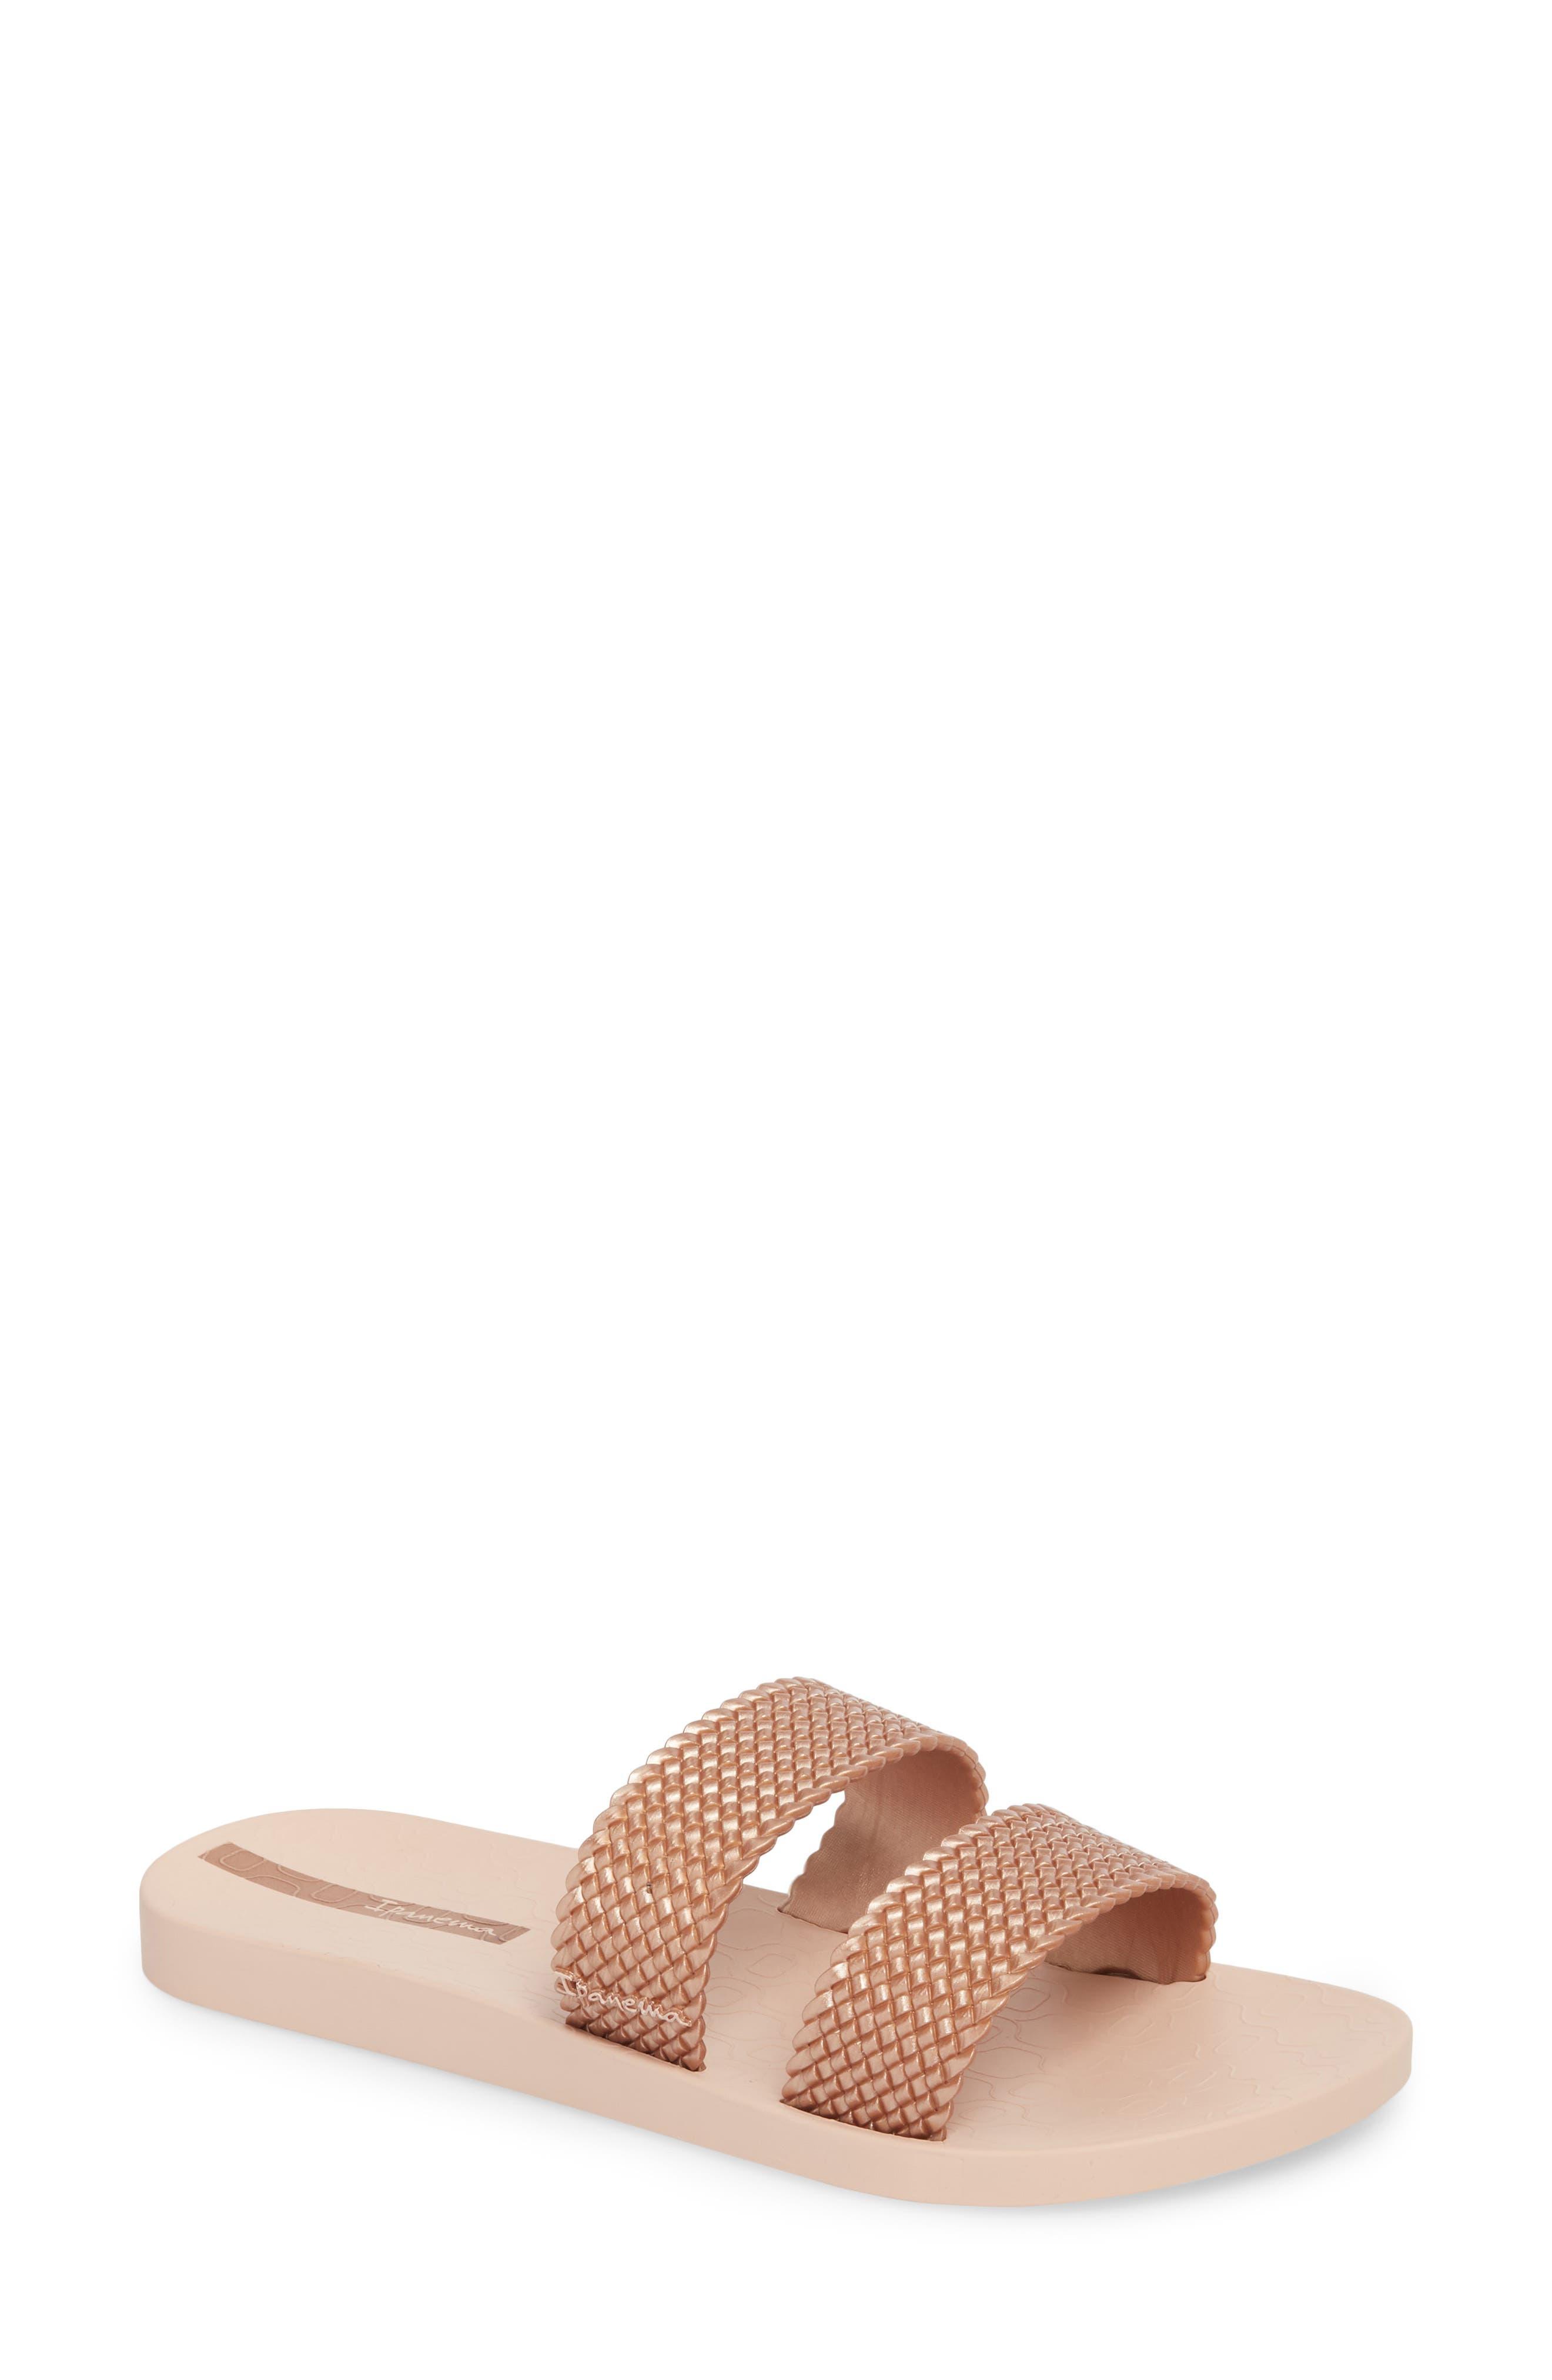 IPANEMA City Slide Sandal in Light Pink/ Rose